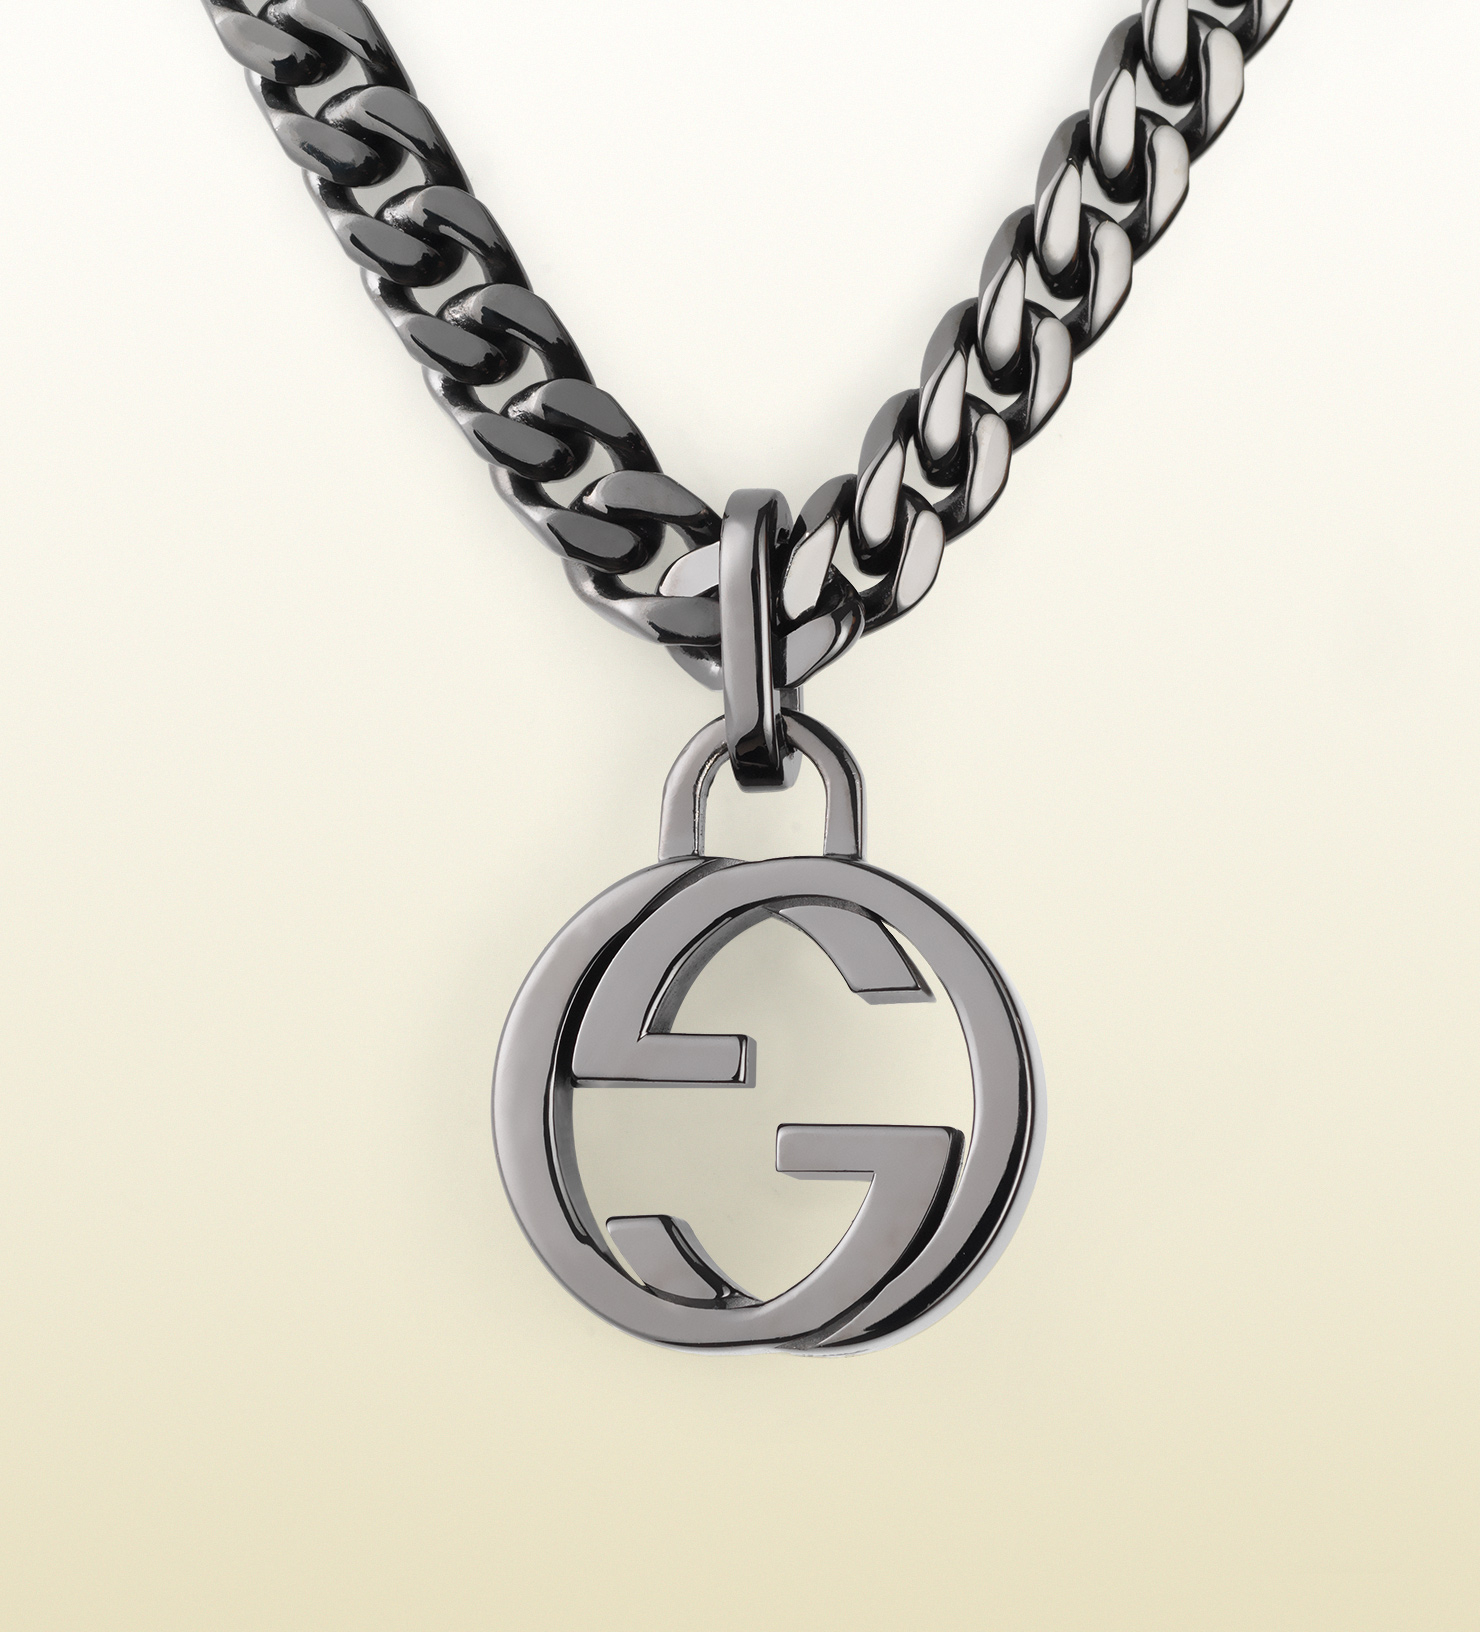 e1b7060ed Lyst Gucci Silver Necklace With Interlocking G Pendant In Metallic